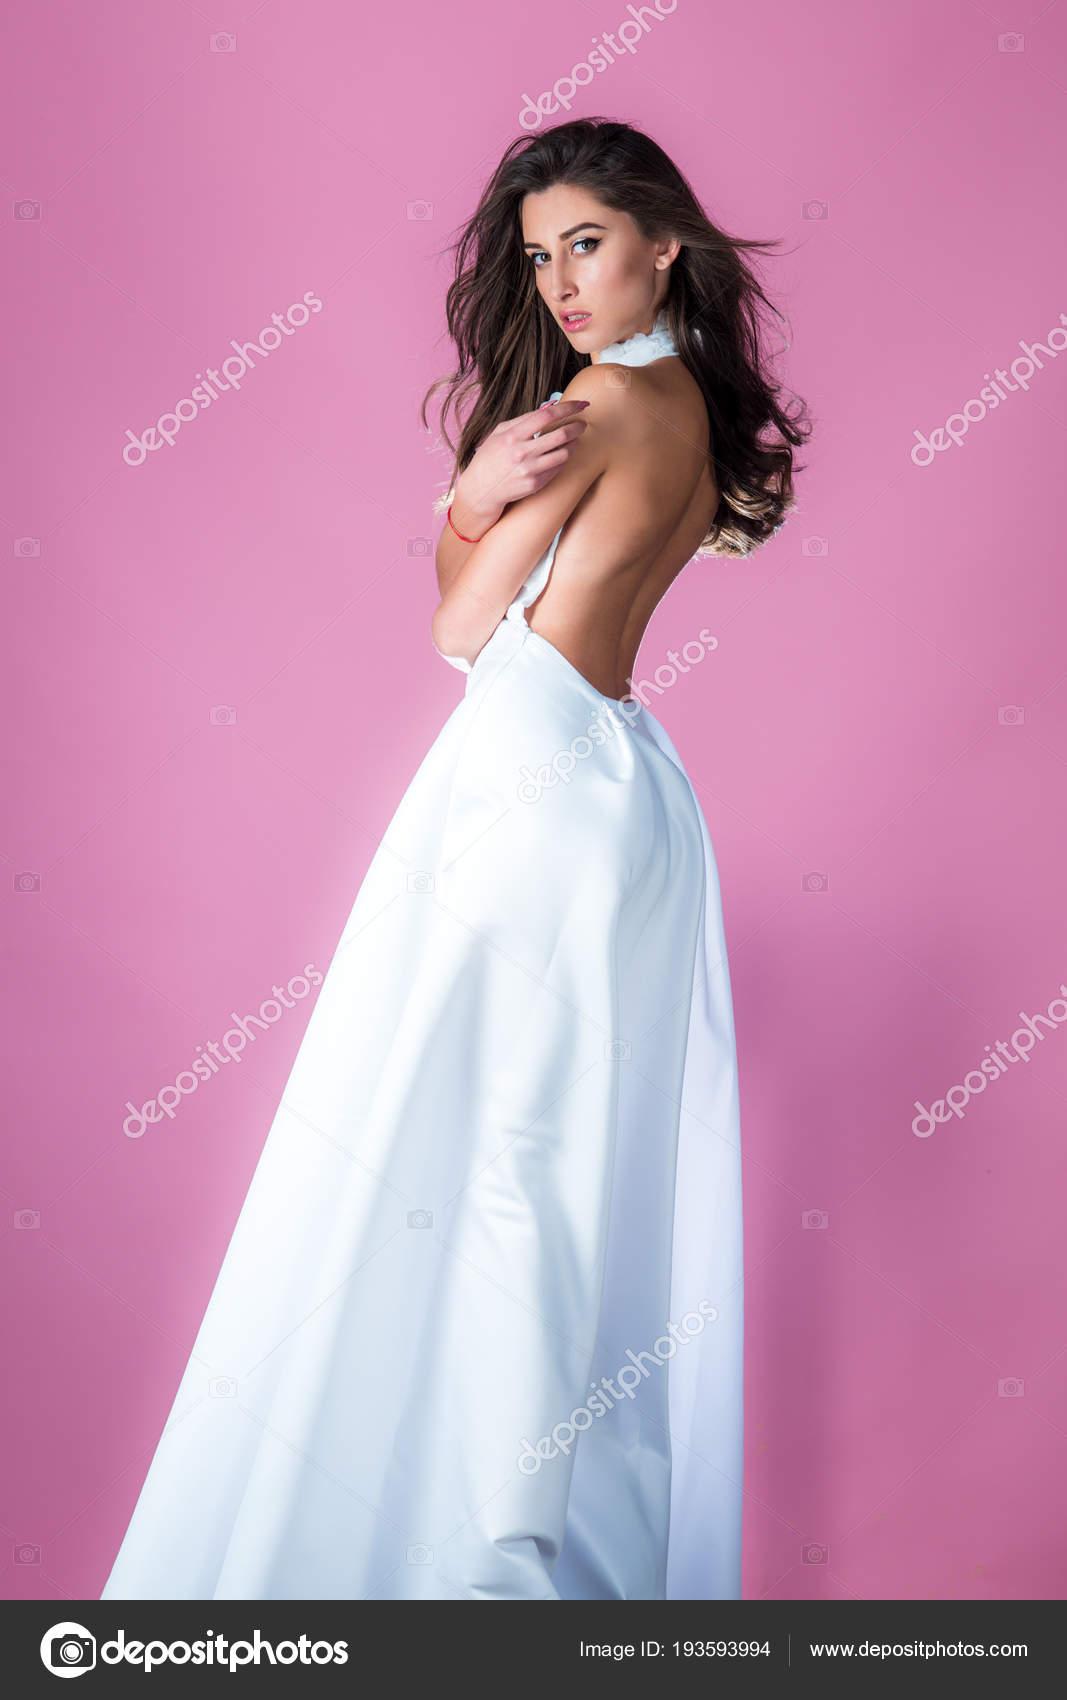 Maquillaje Moda Hermosa Mujer Morena Pelo Usar Seda Blanco Vestido ...